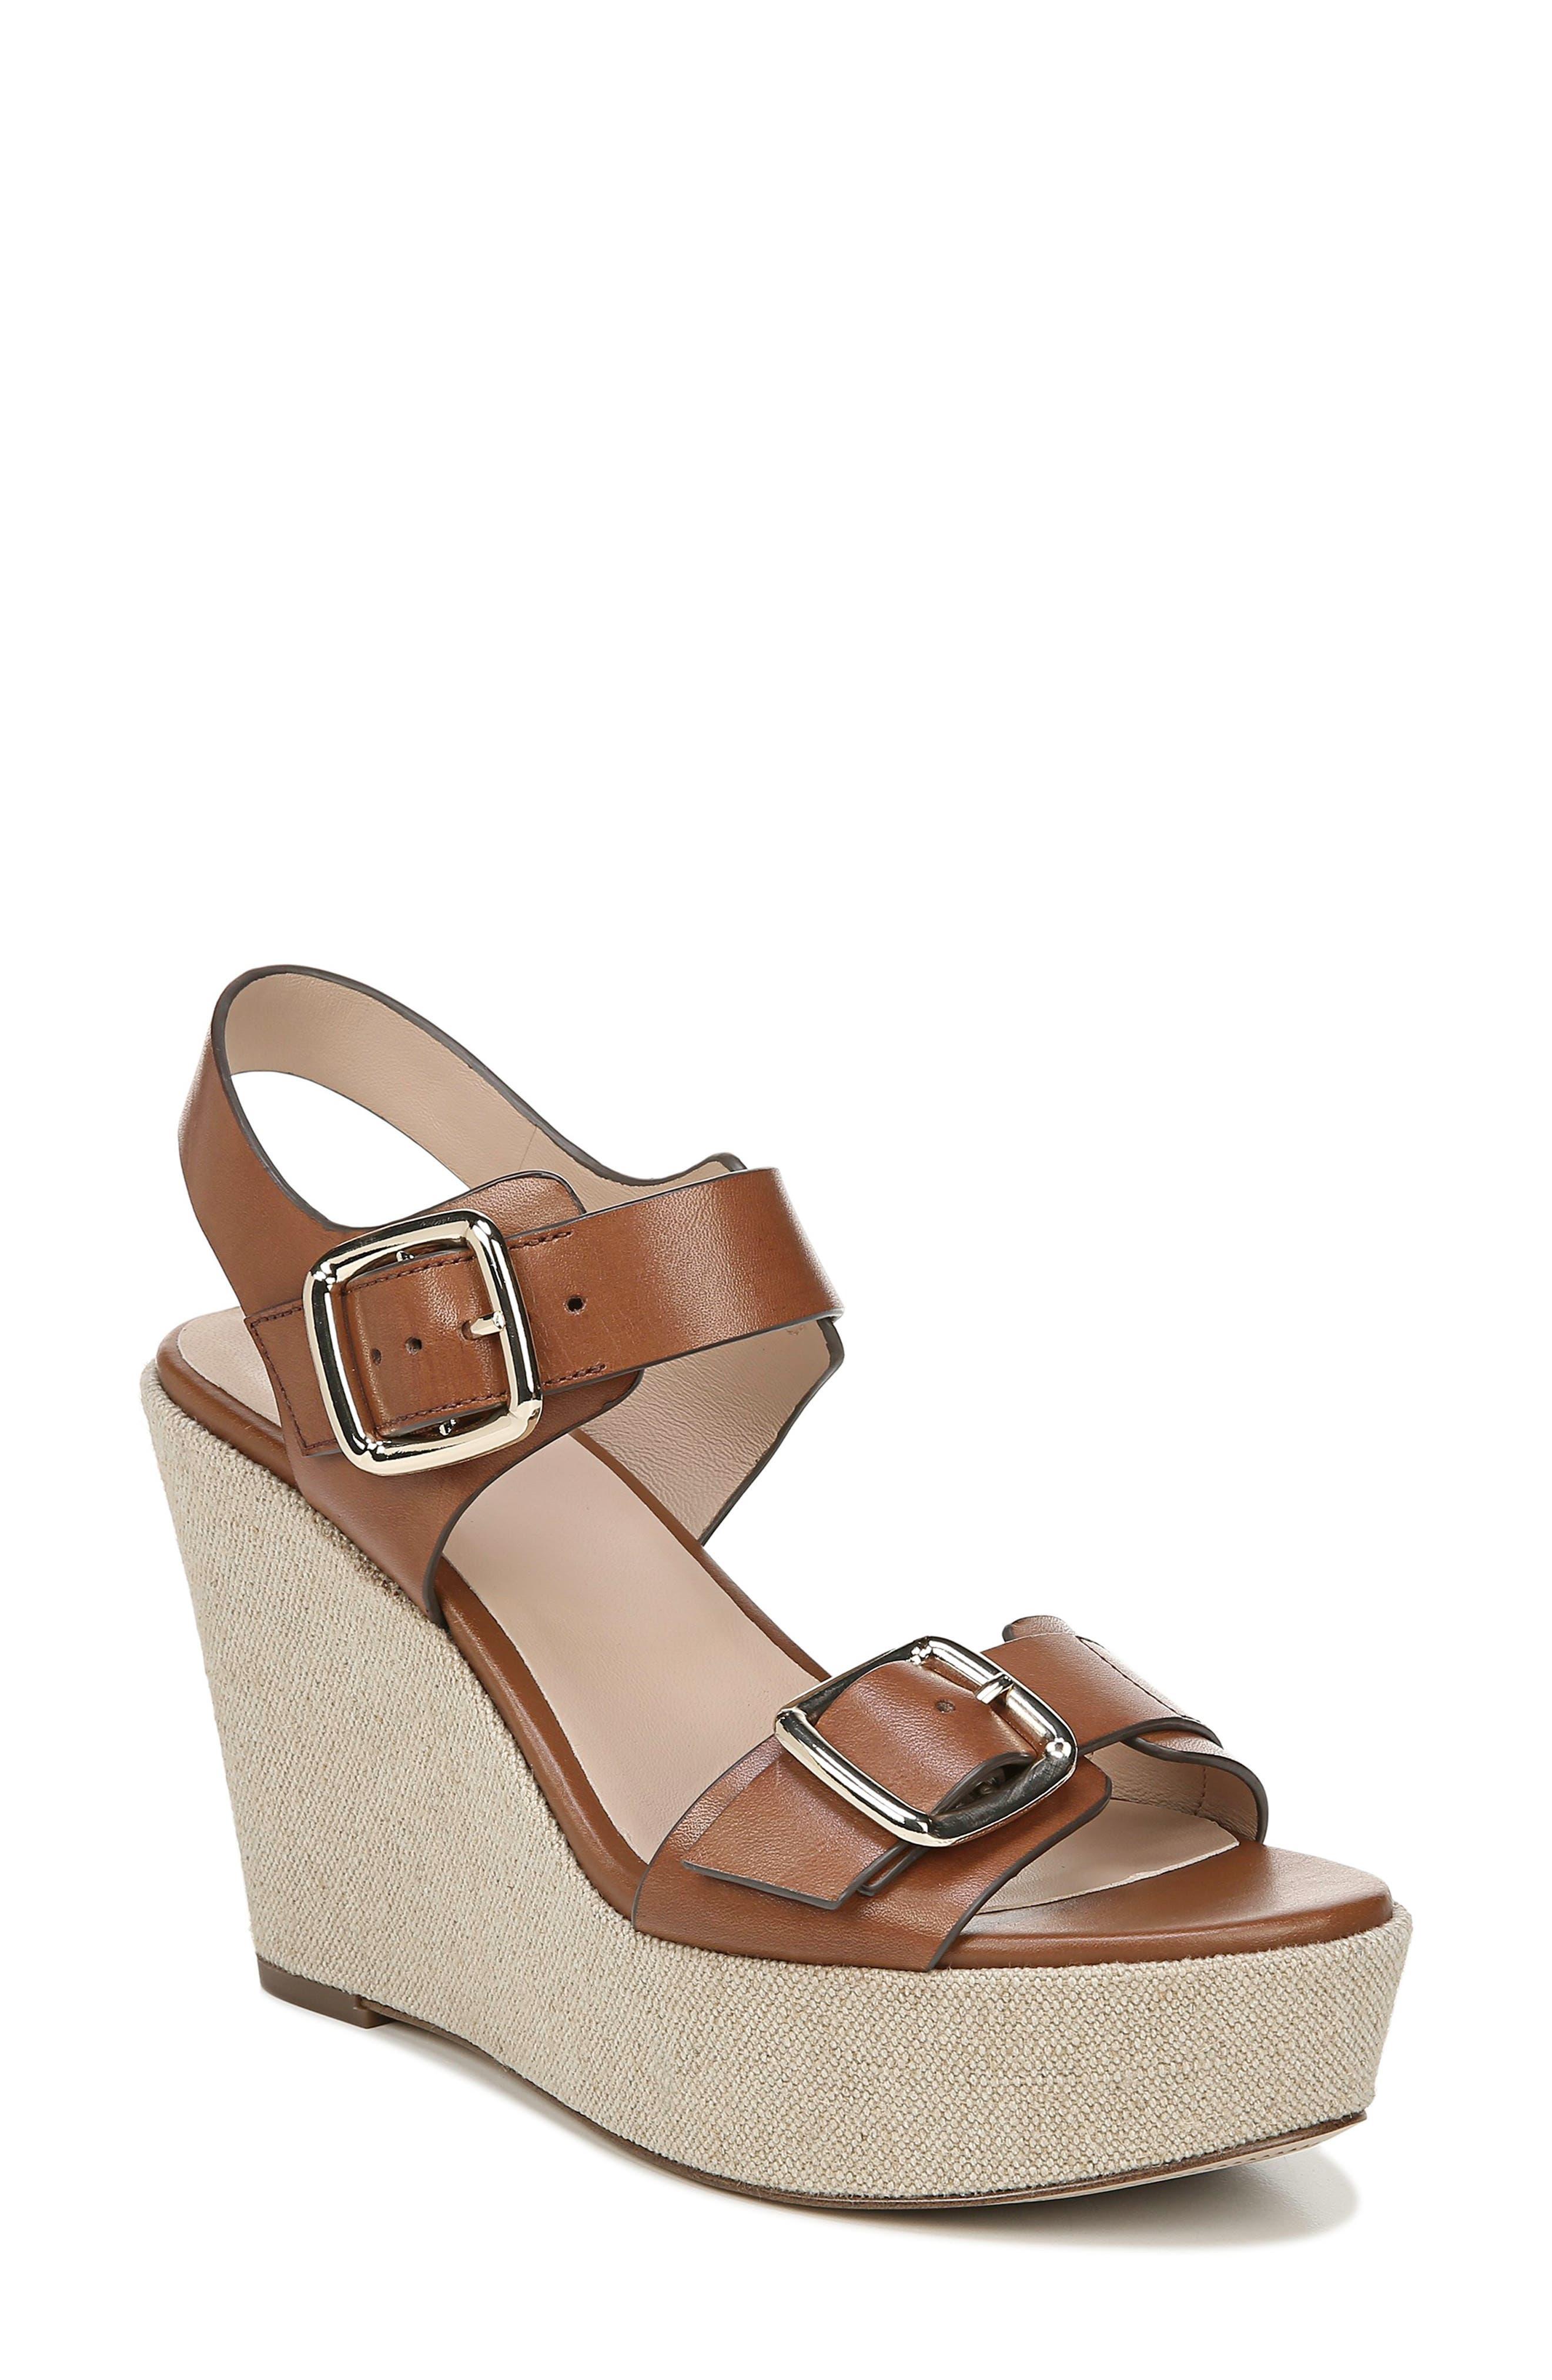 Cait Wedge Sandal, Main, color, SADDLE LEATHER